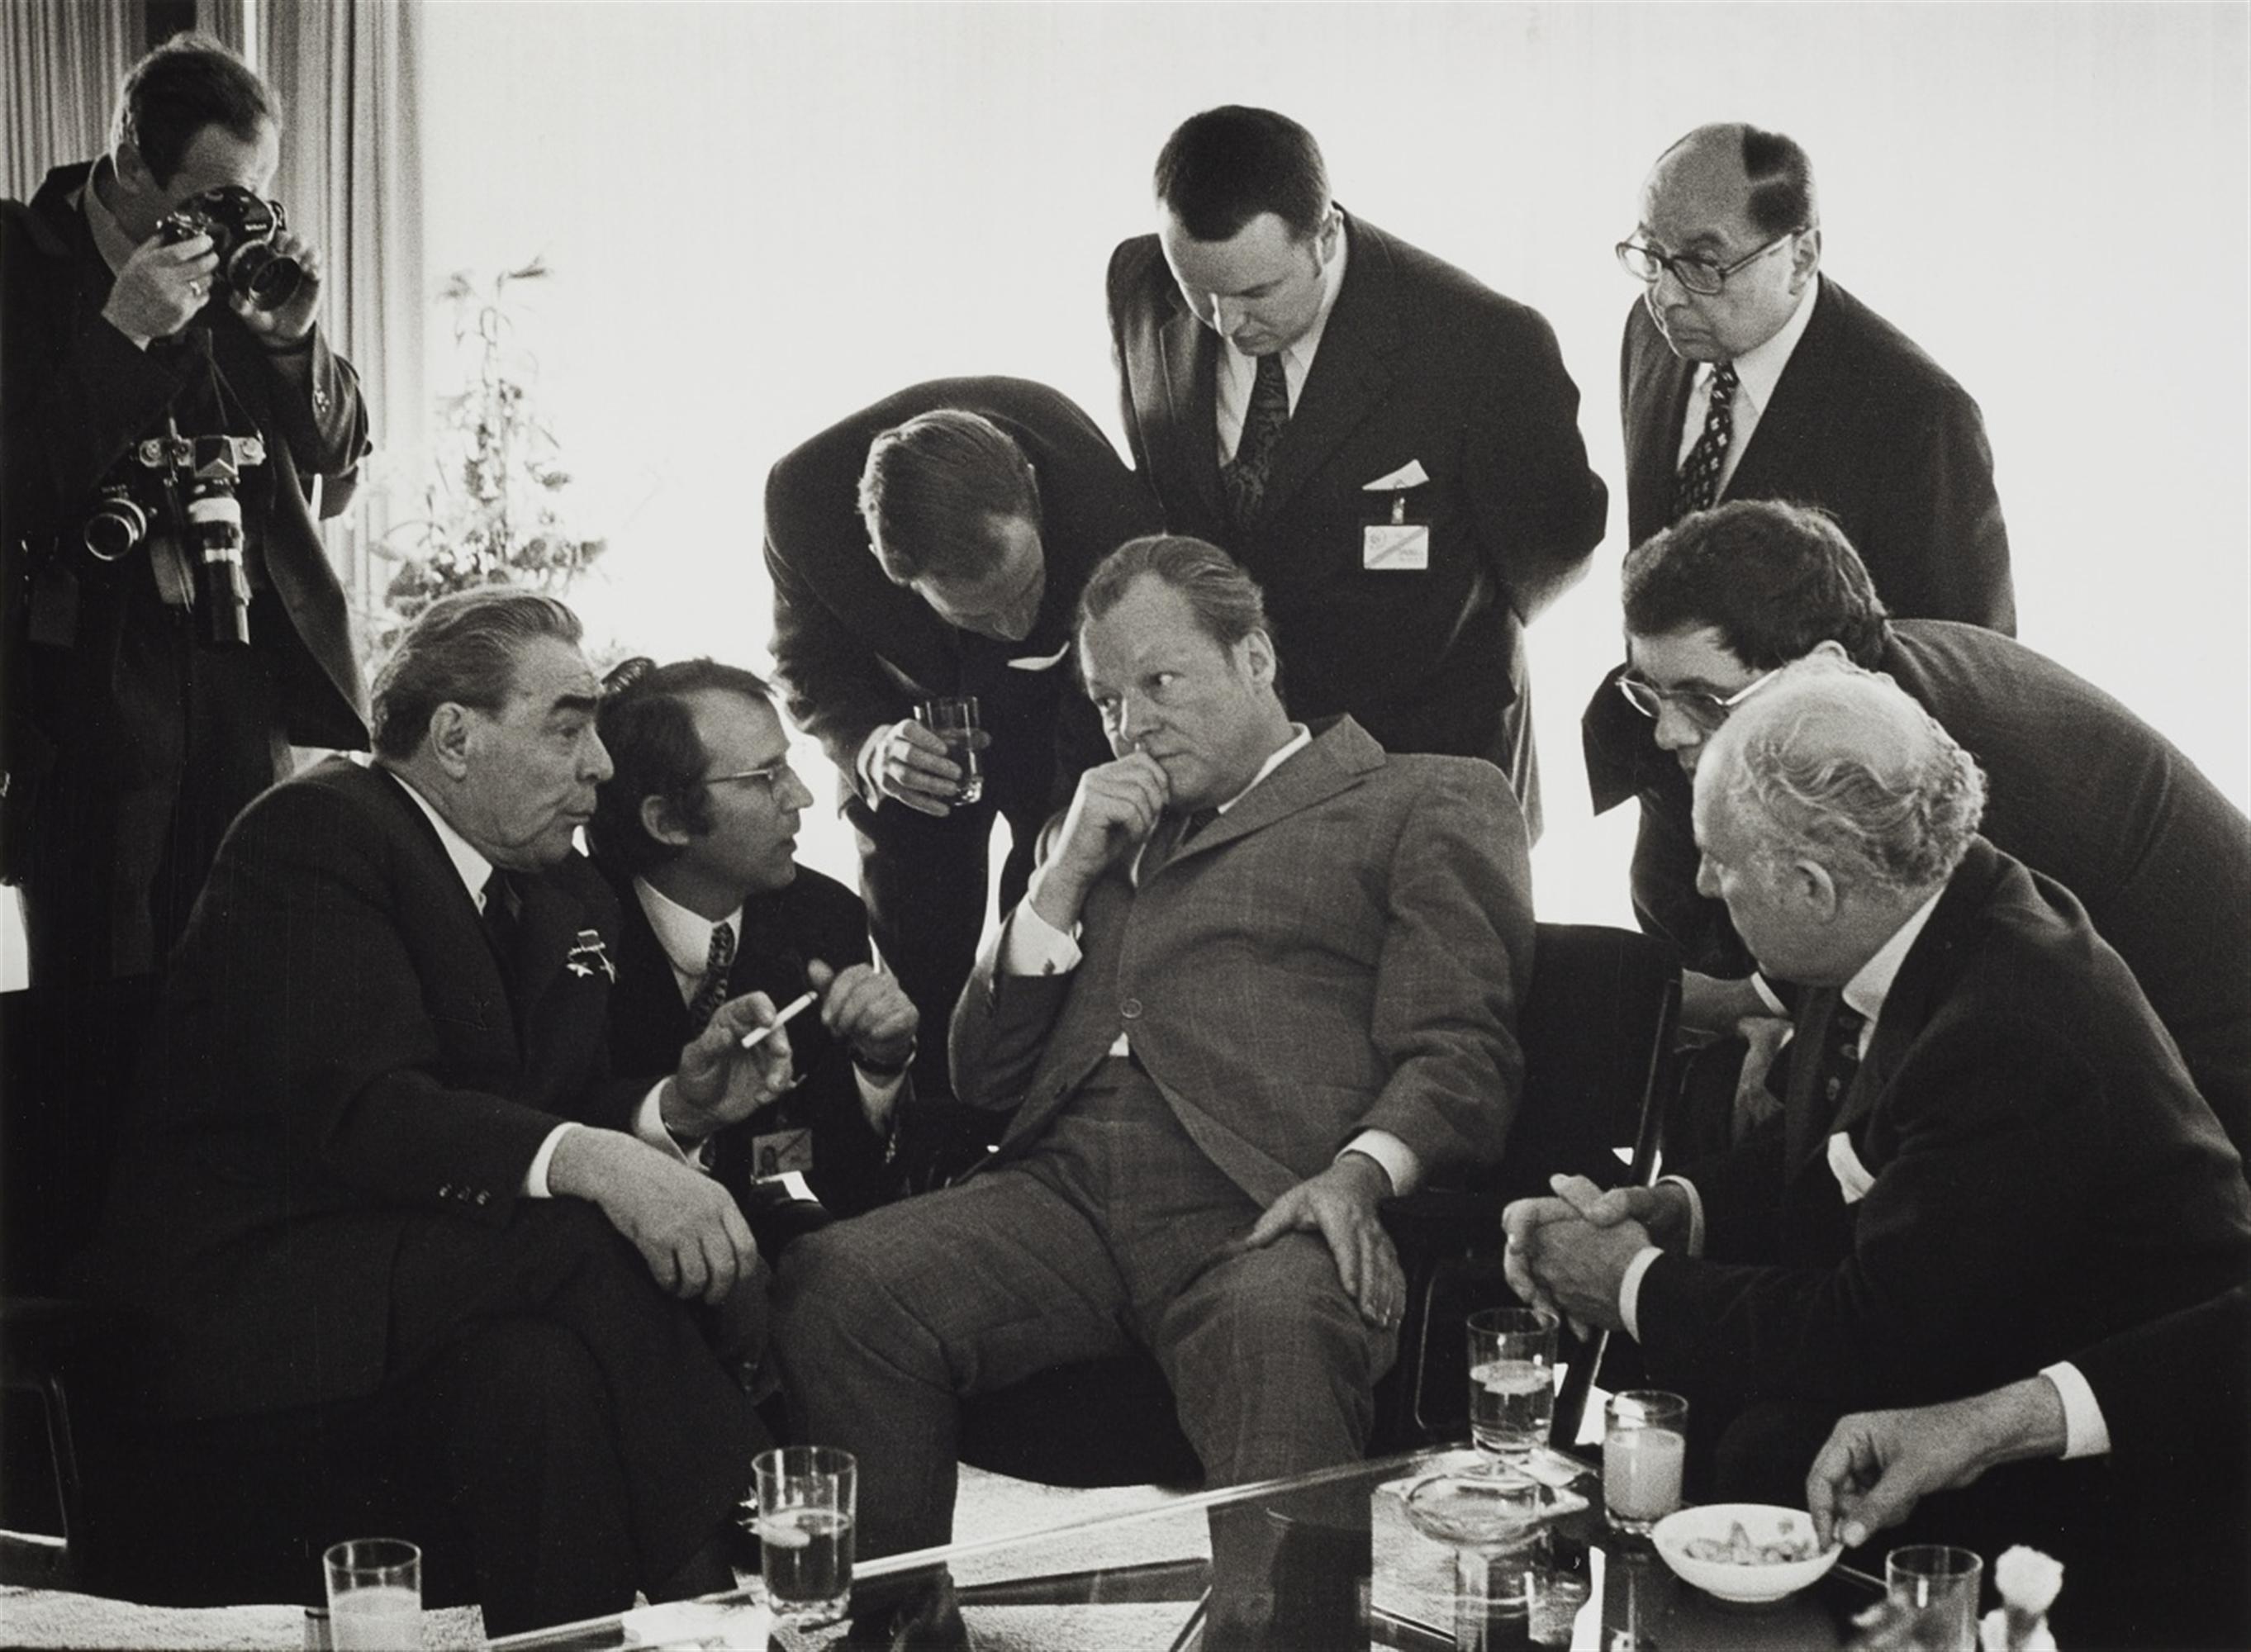 Barbara Klemm<BR>Leonid Breschnew, Willy Brandt, Bonn